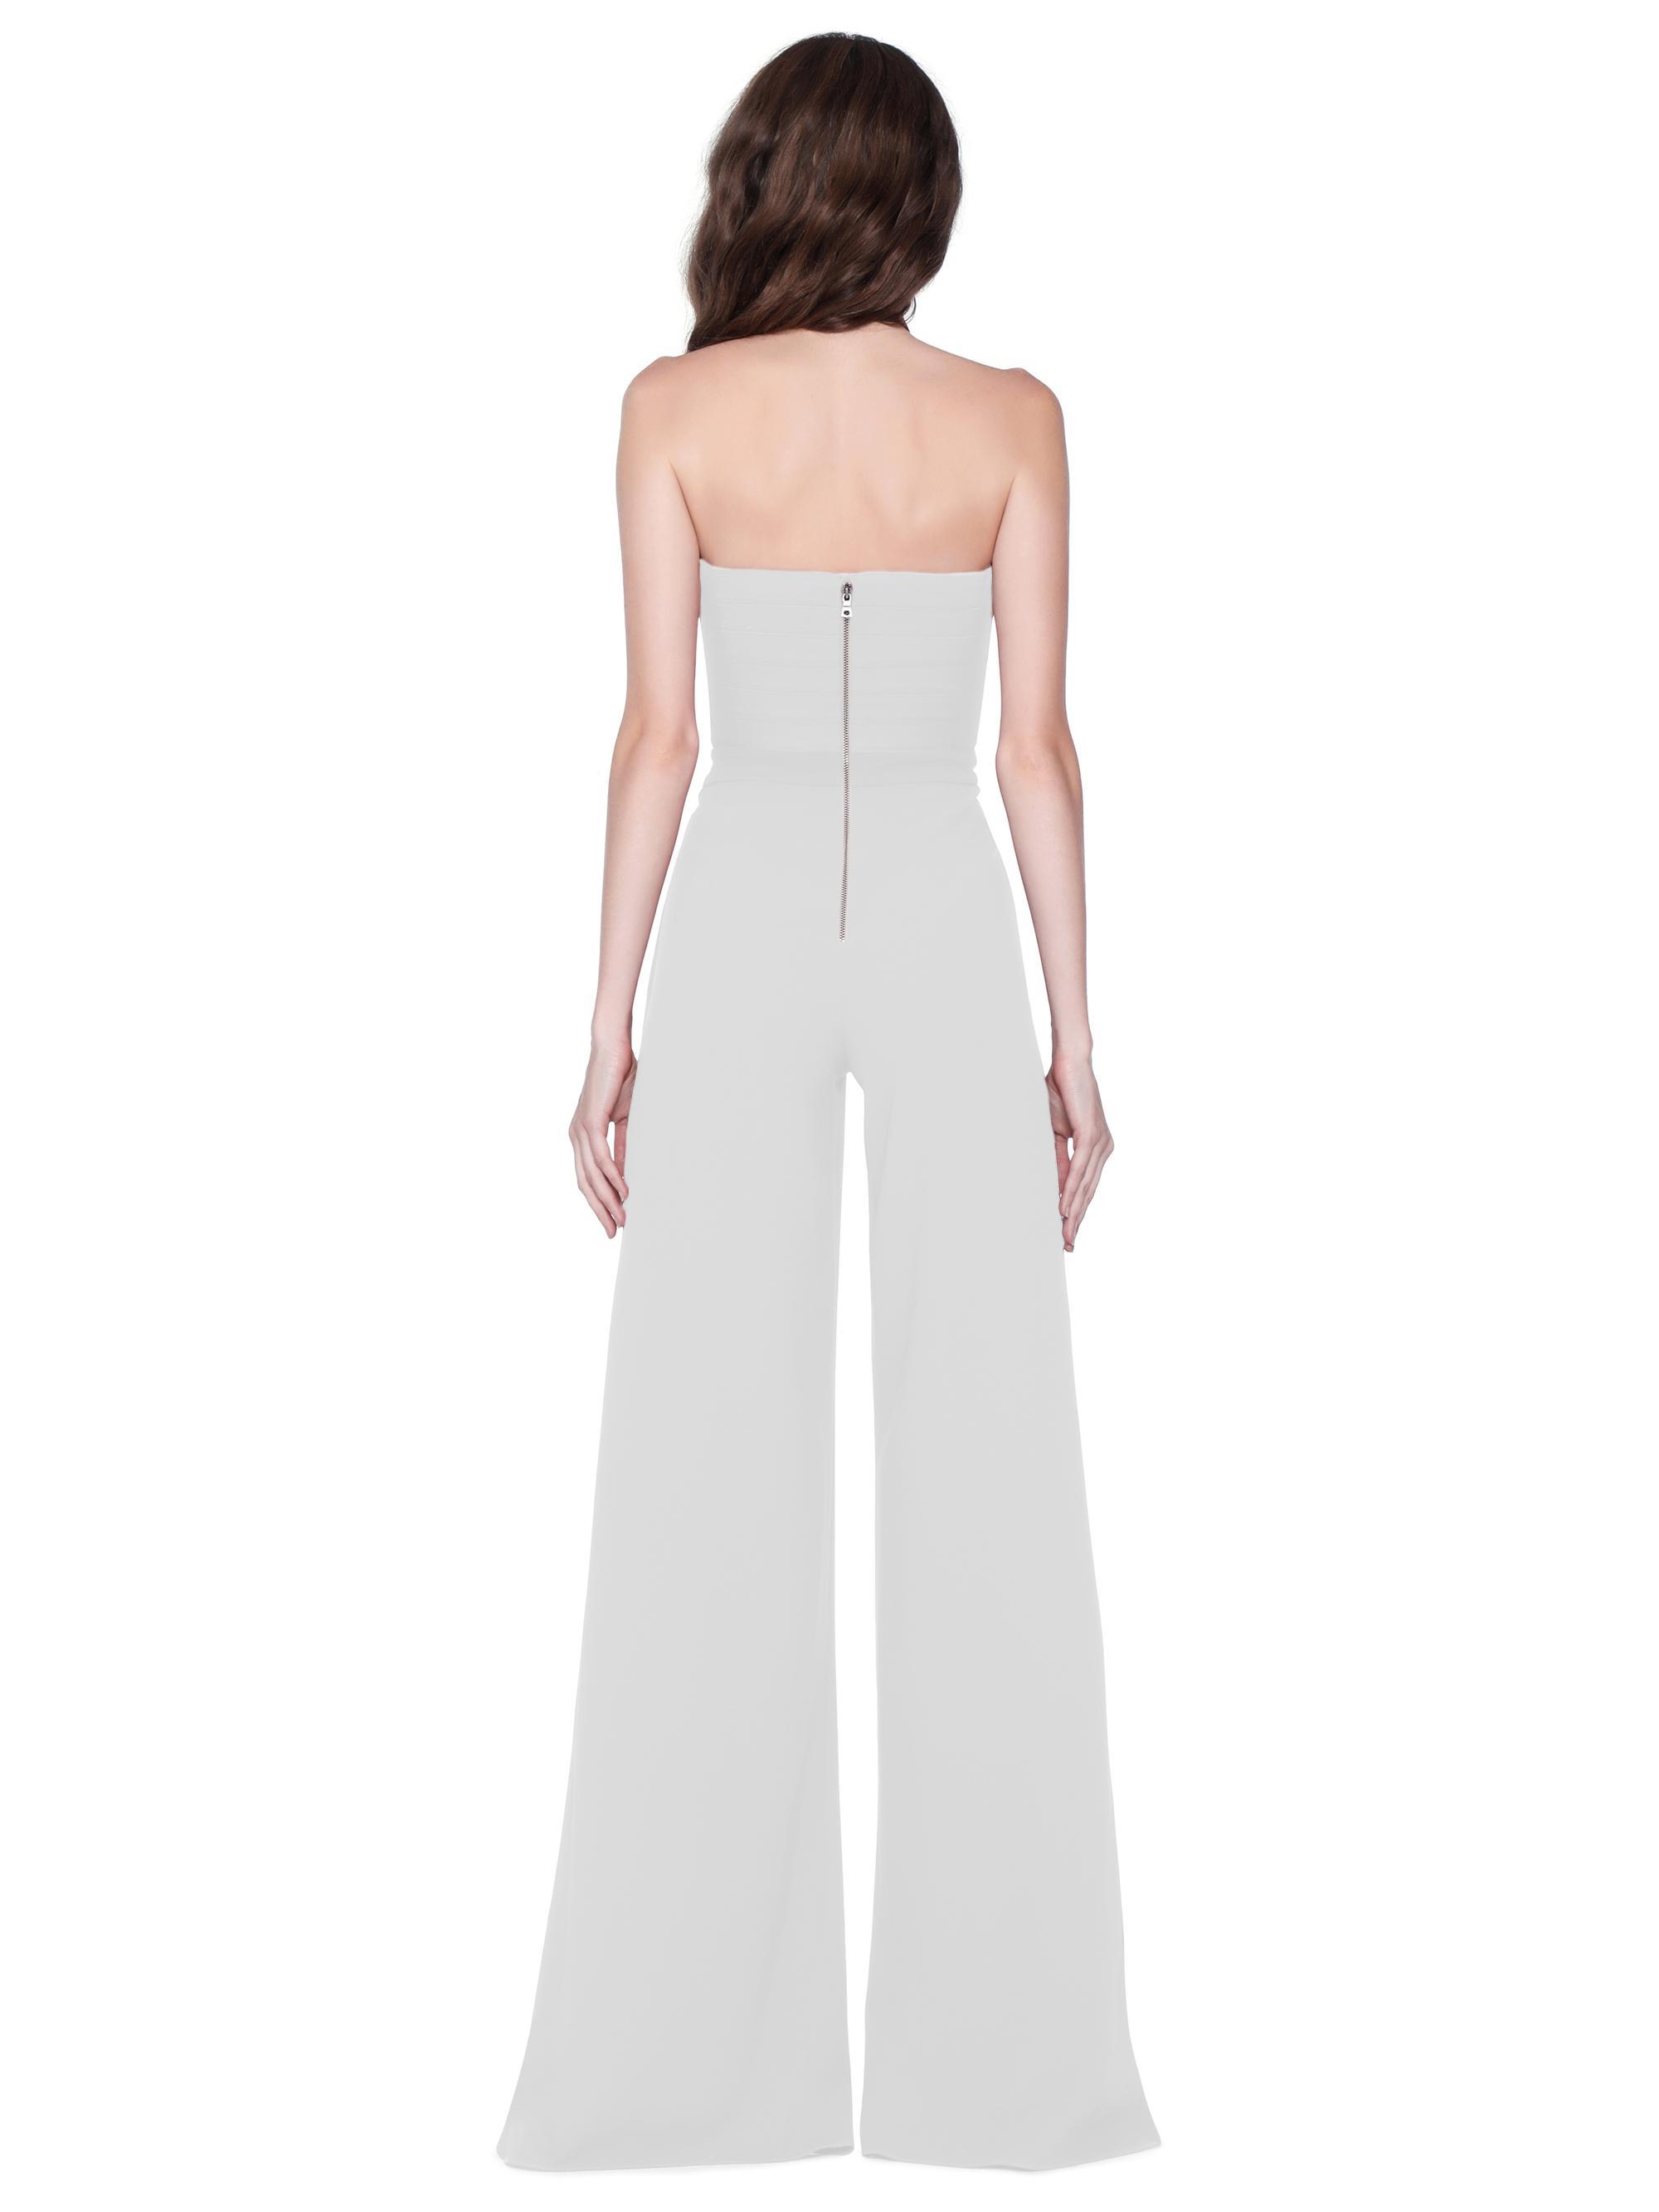 072087d1e87 Lyst - Alice + Olivia Latonya Ruffled Jumpsuit in White